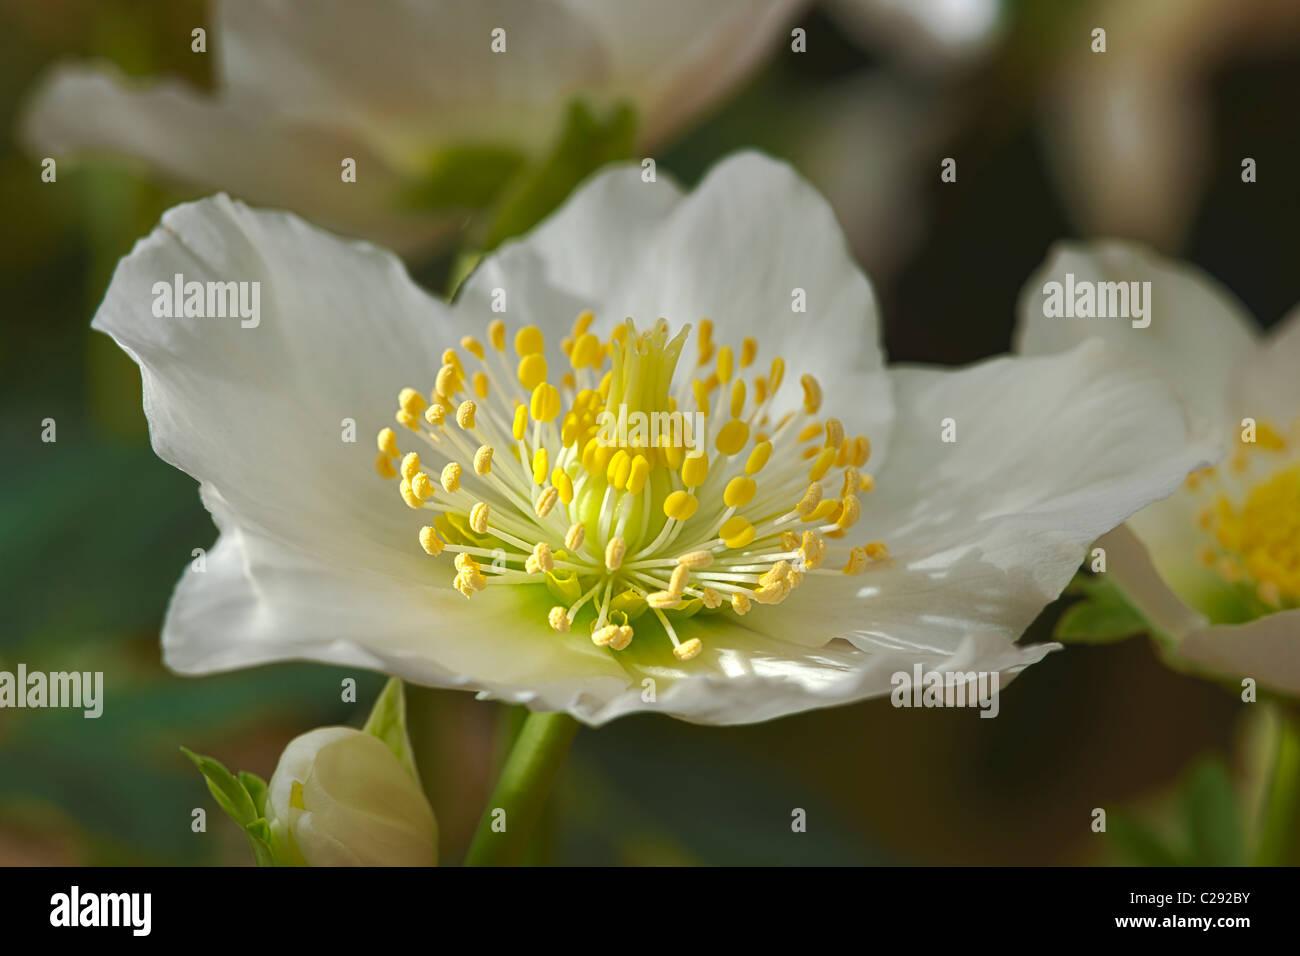 Christmas rose Helleborus niger Hellebore late winter flower perennial white cream December garden plant - Stock Image